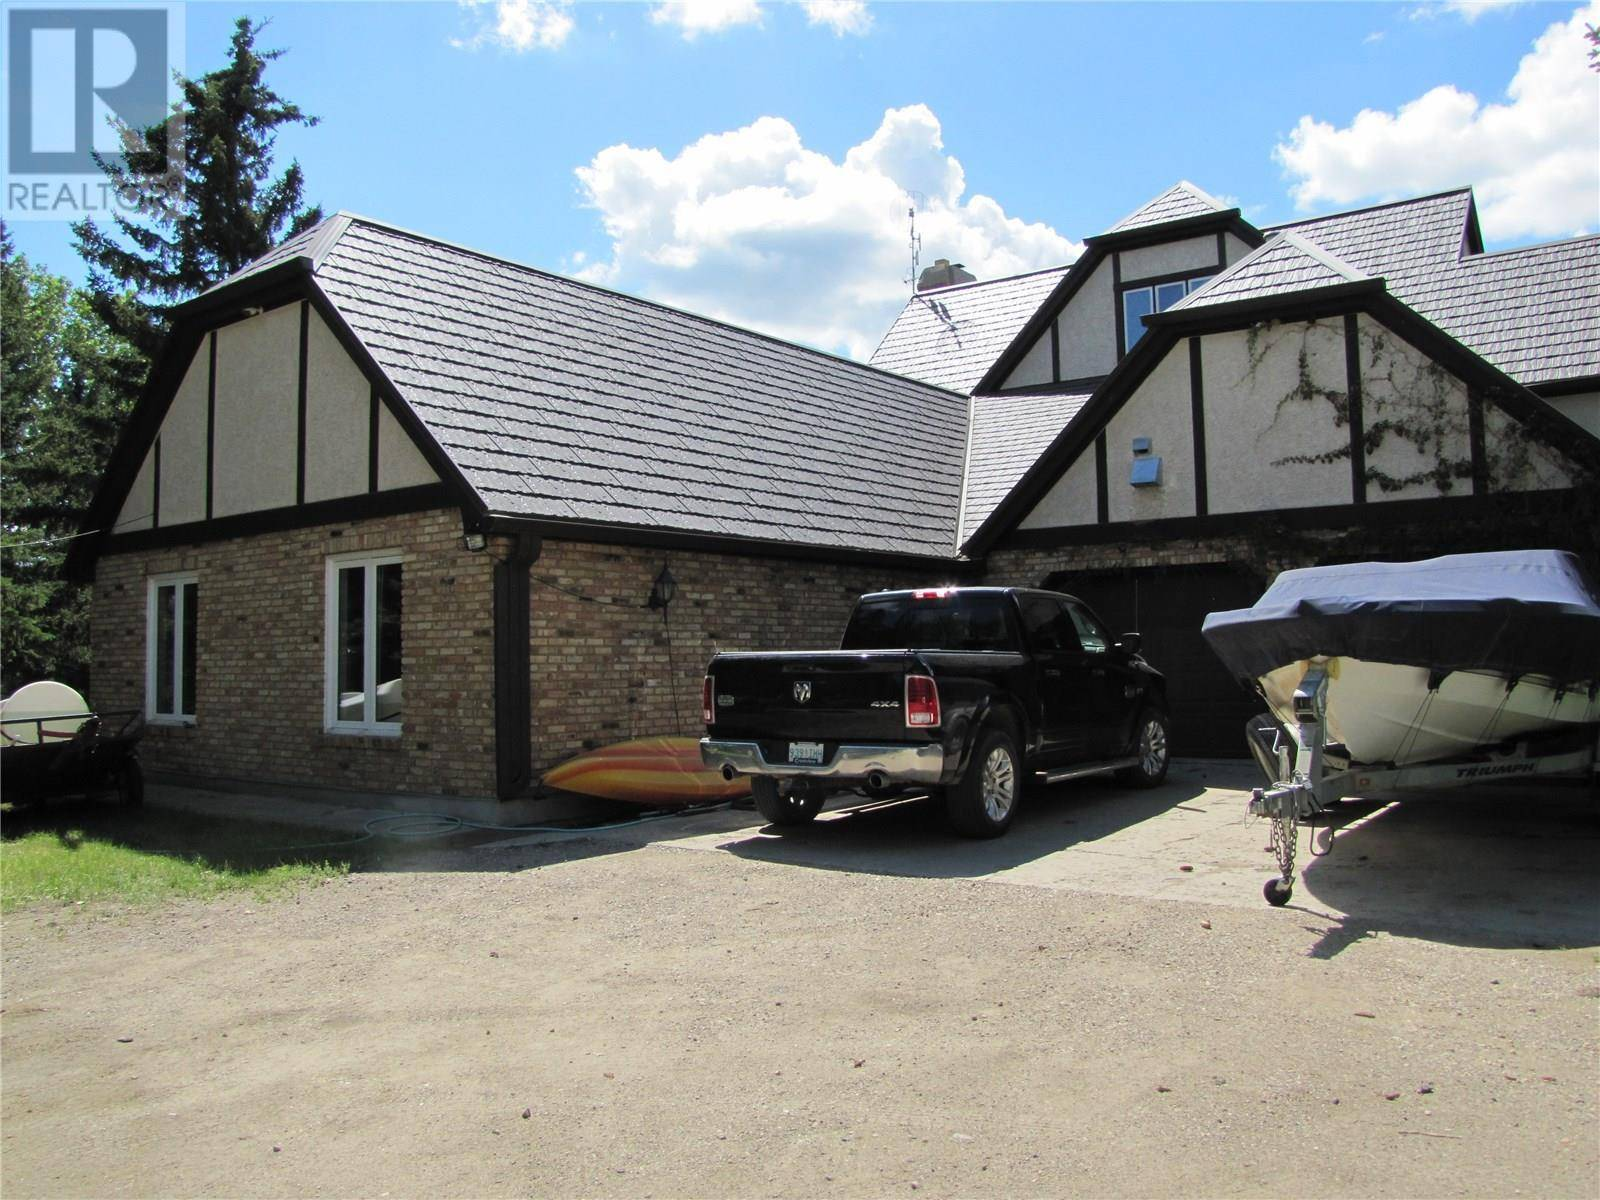 159 Schneider Acreage , Sherwood Rm No. 159 | Image 2